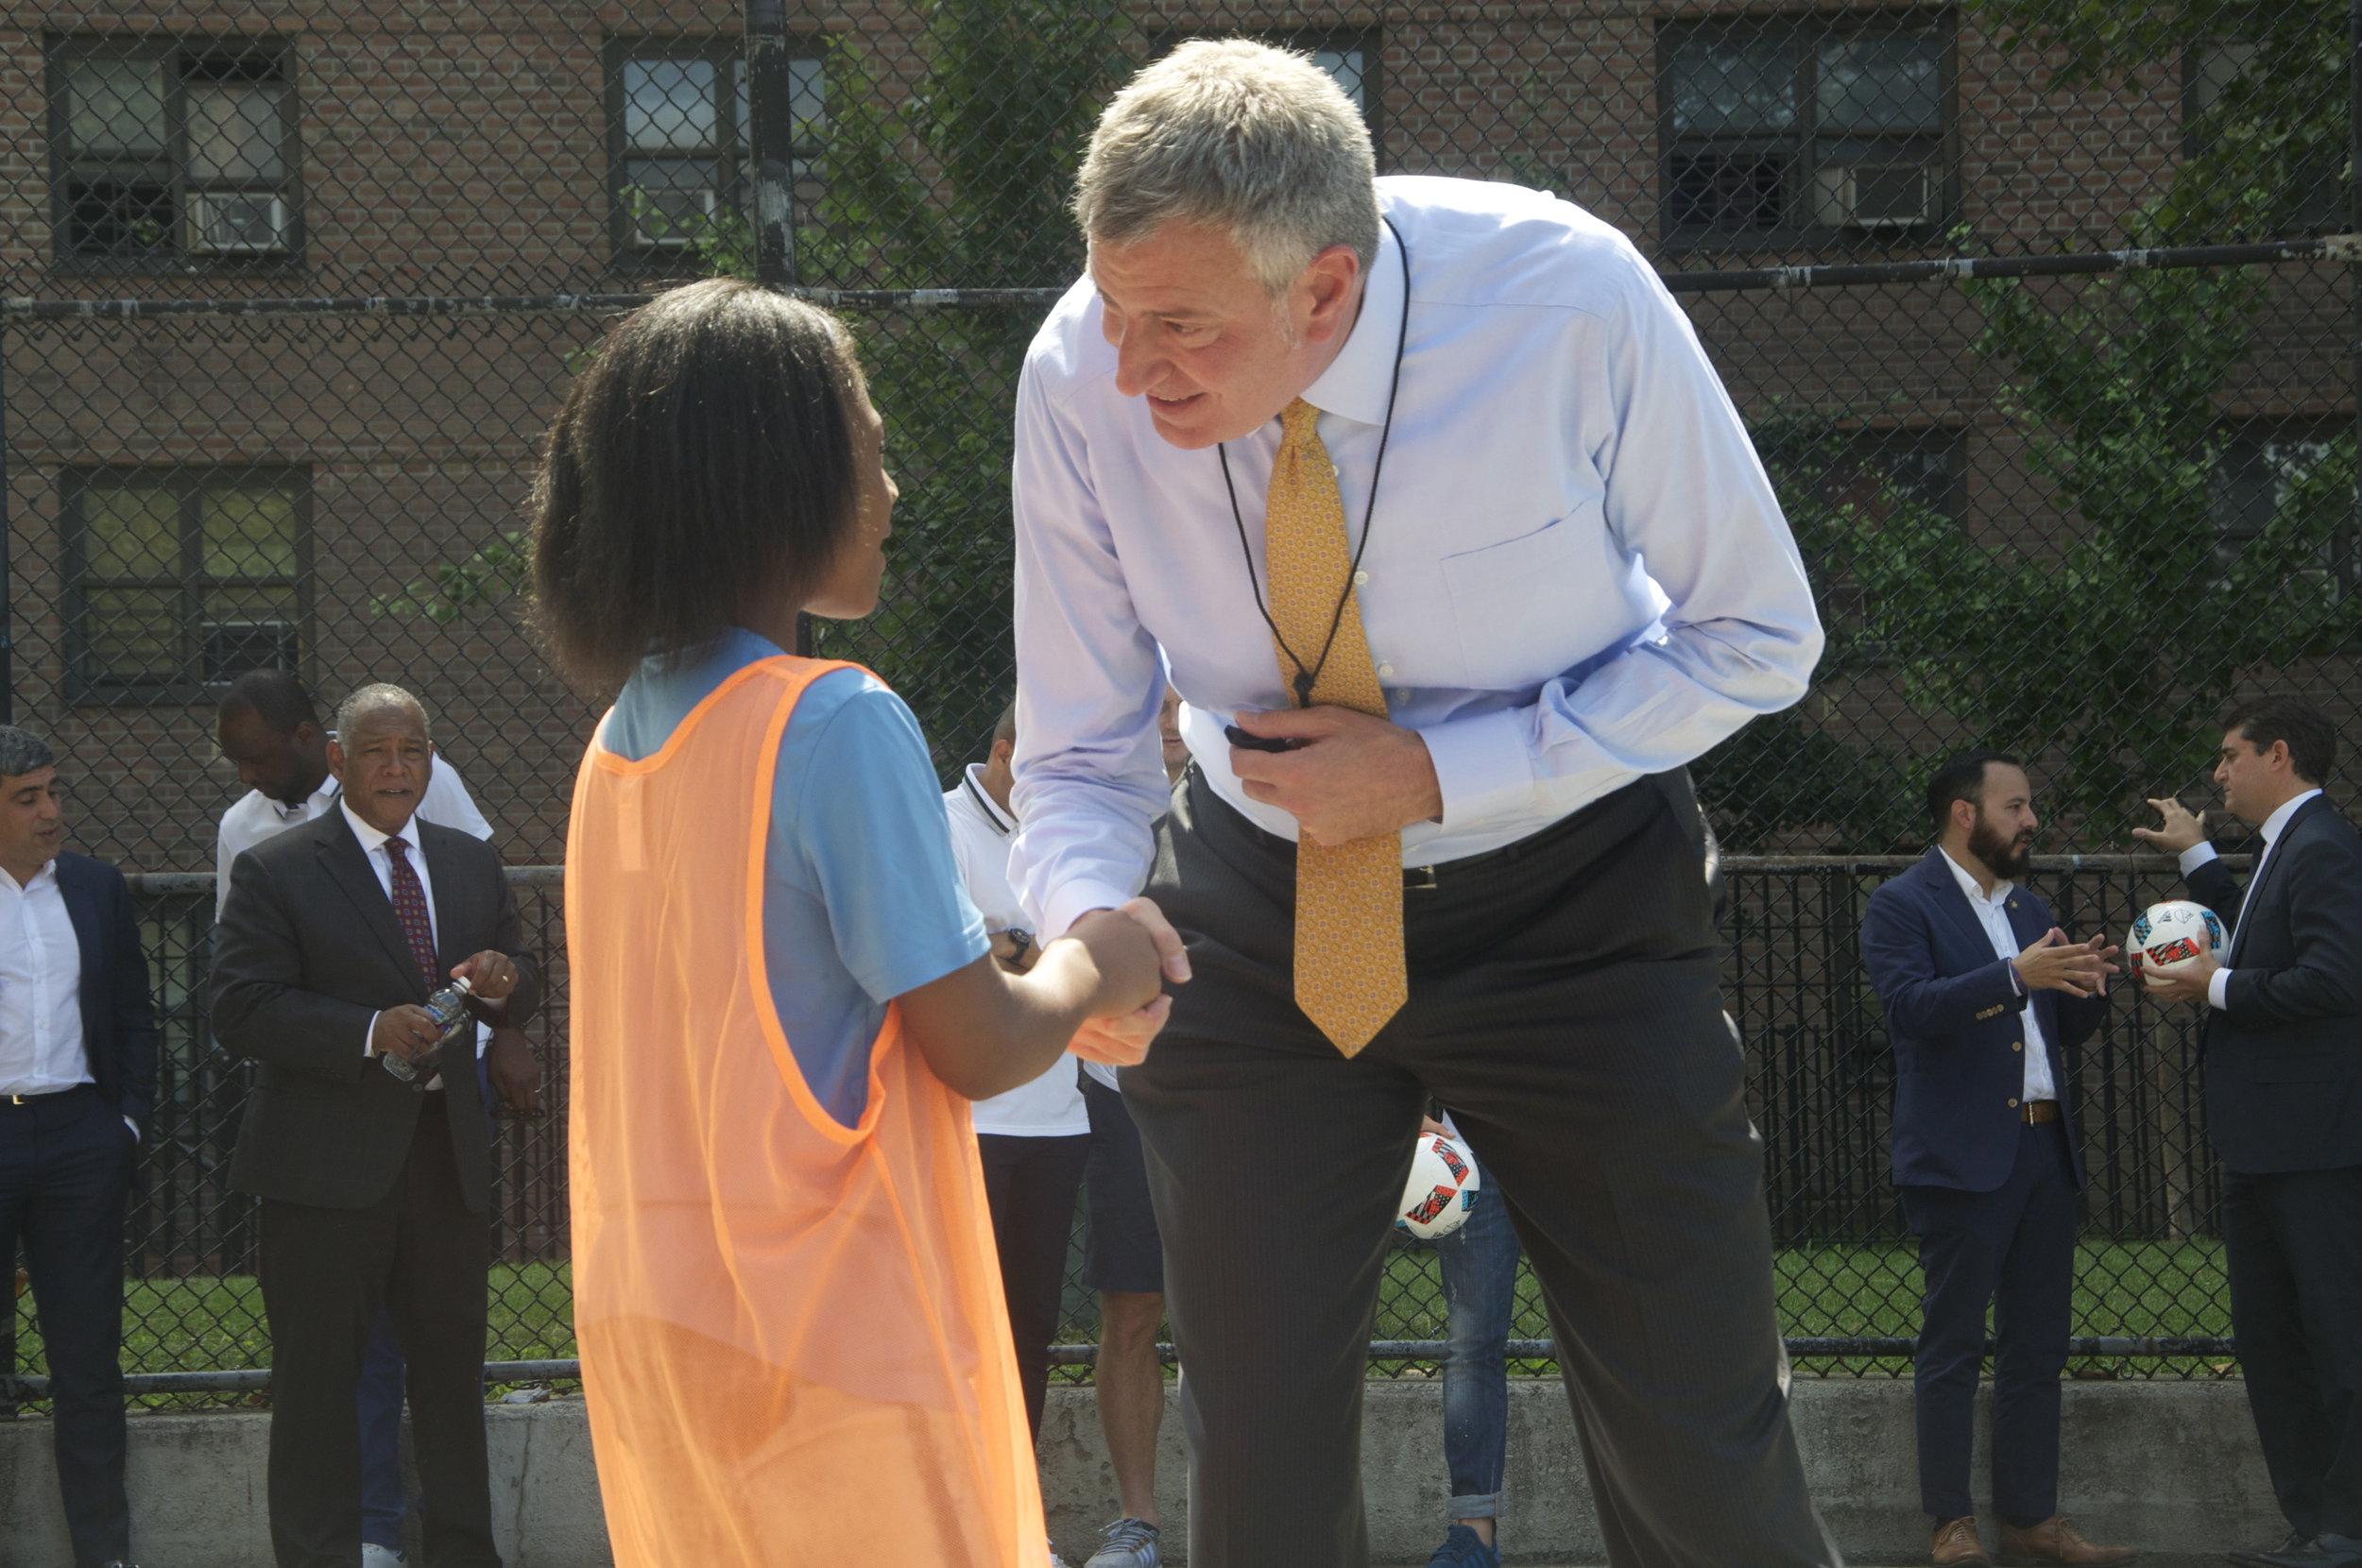 mayor and kid.jpg